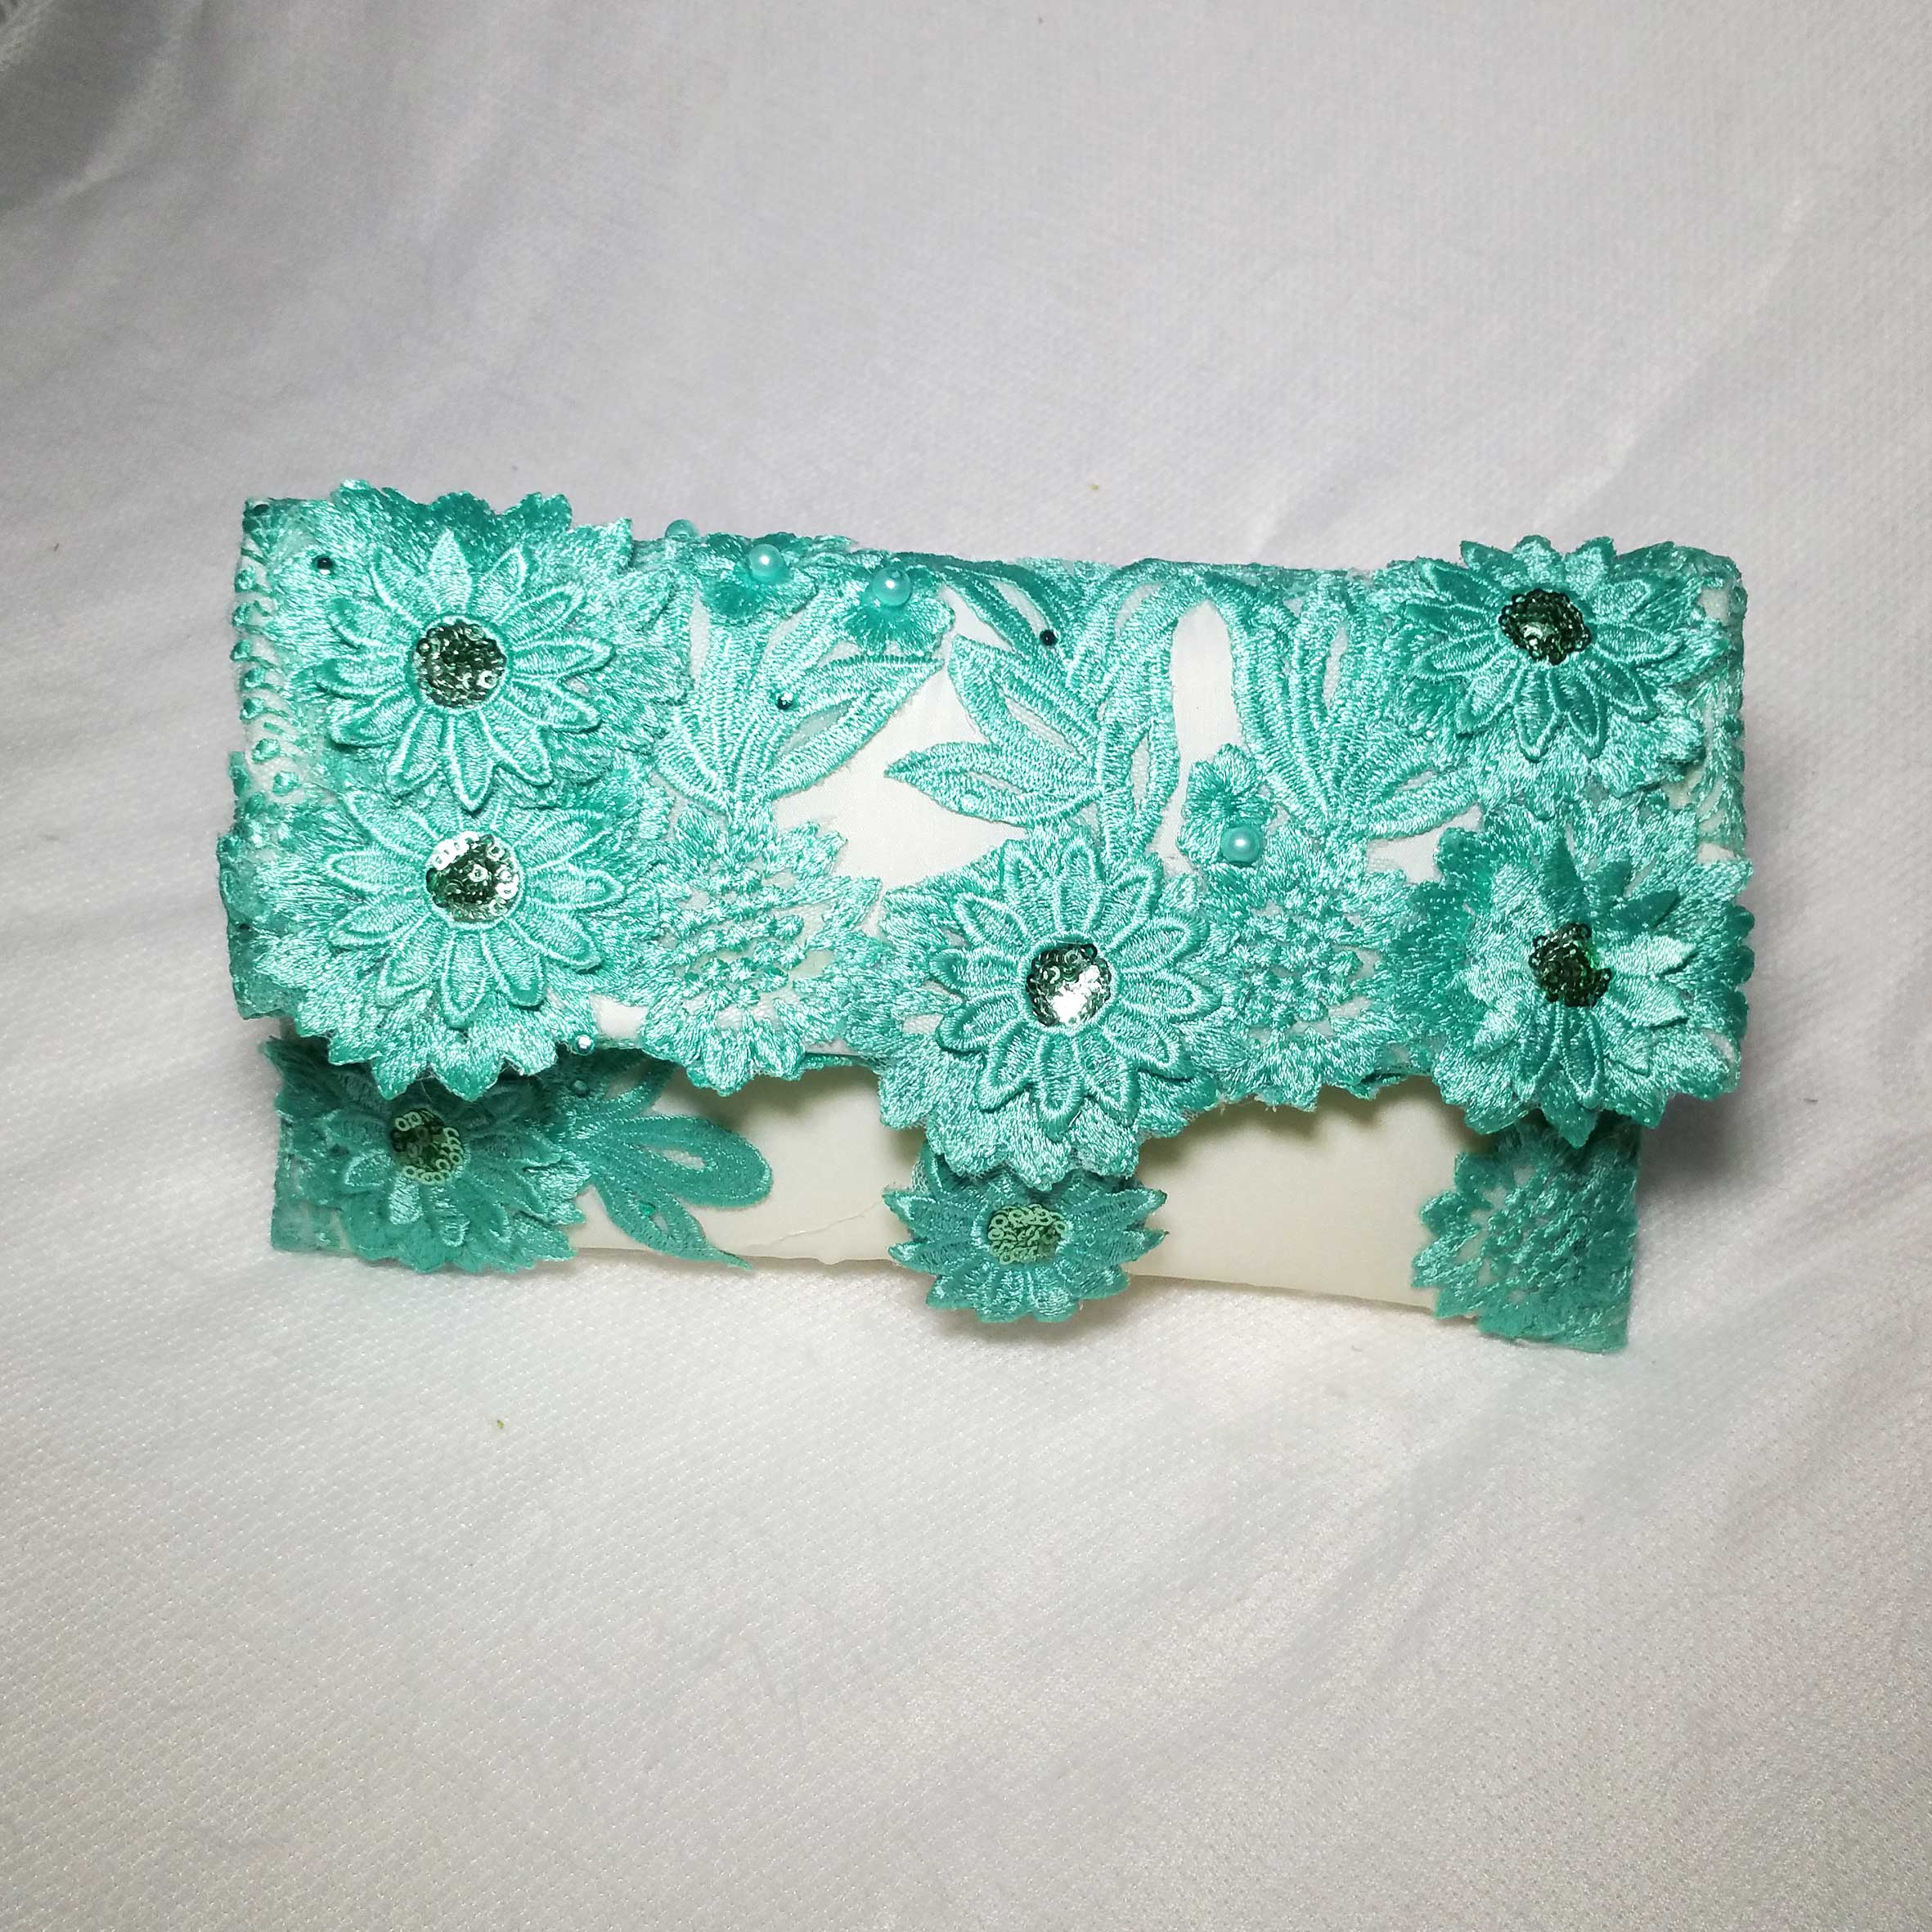 Green Brocade Clutch Handbag